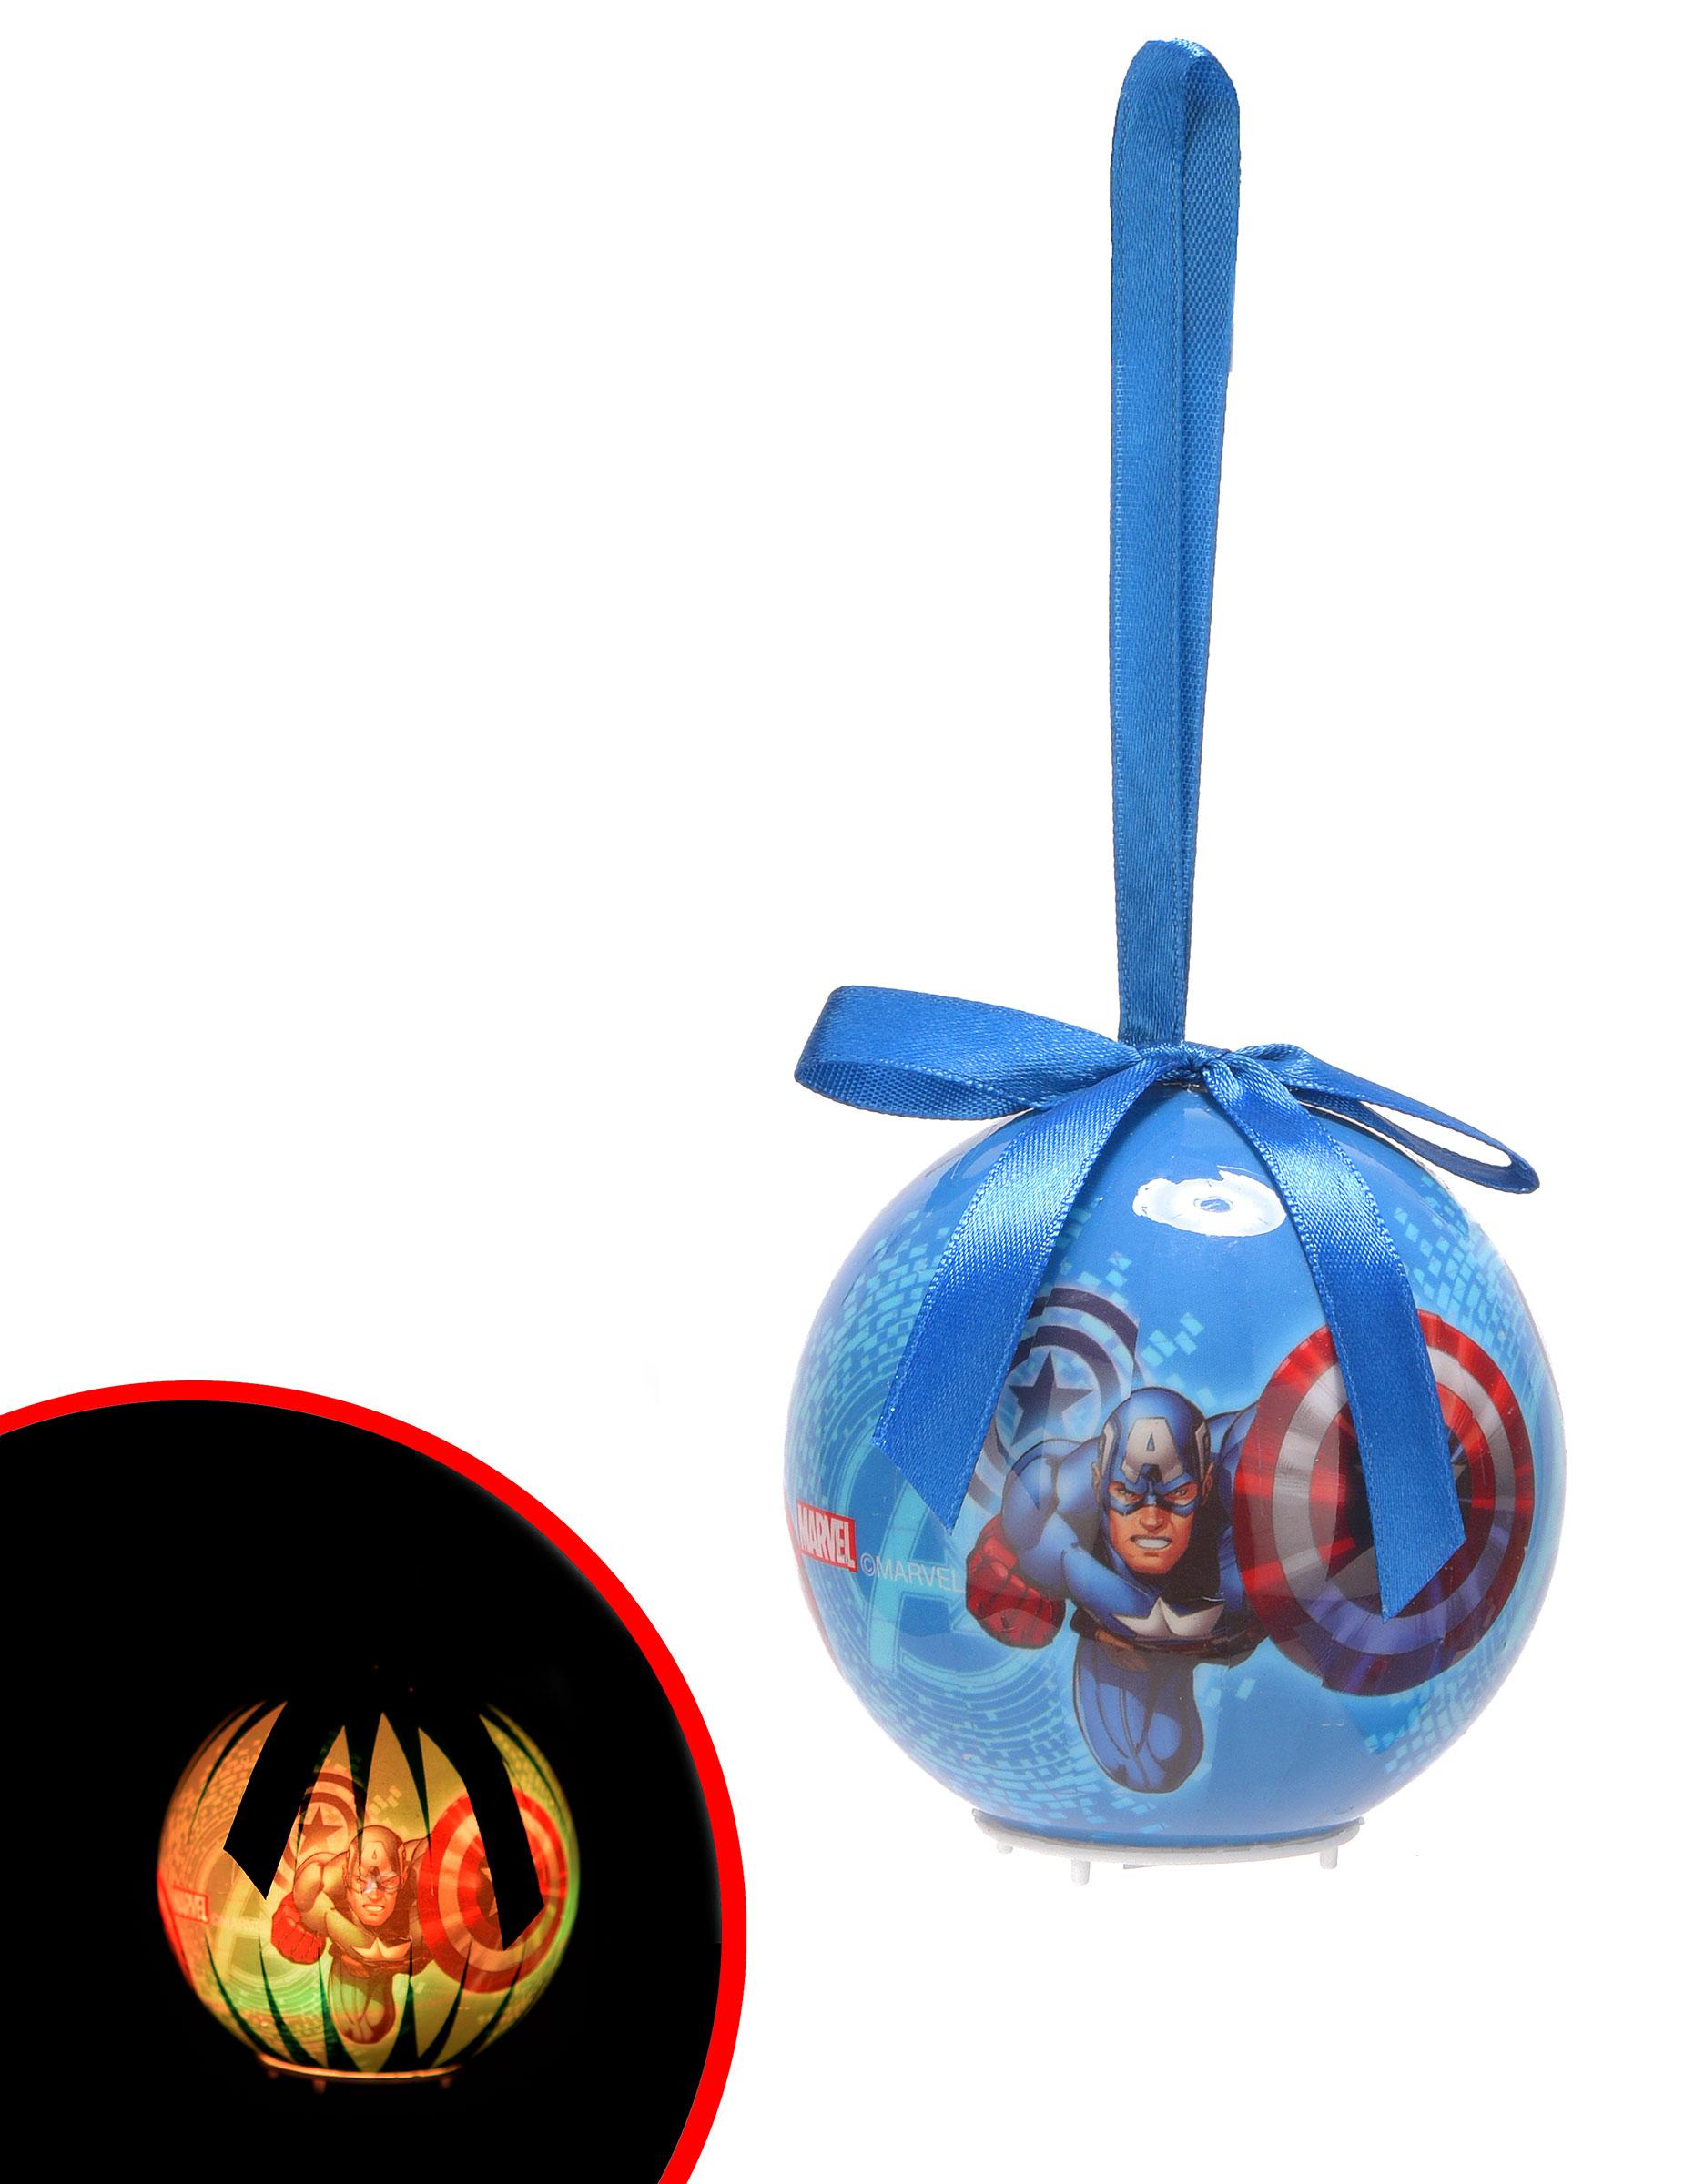 Pallina di Natale luminosa Disney Topolino